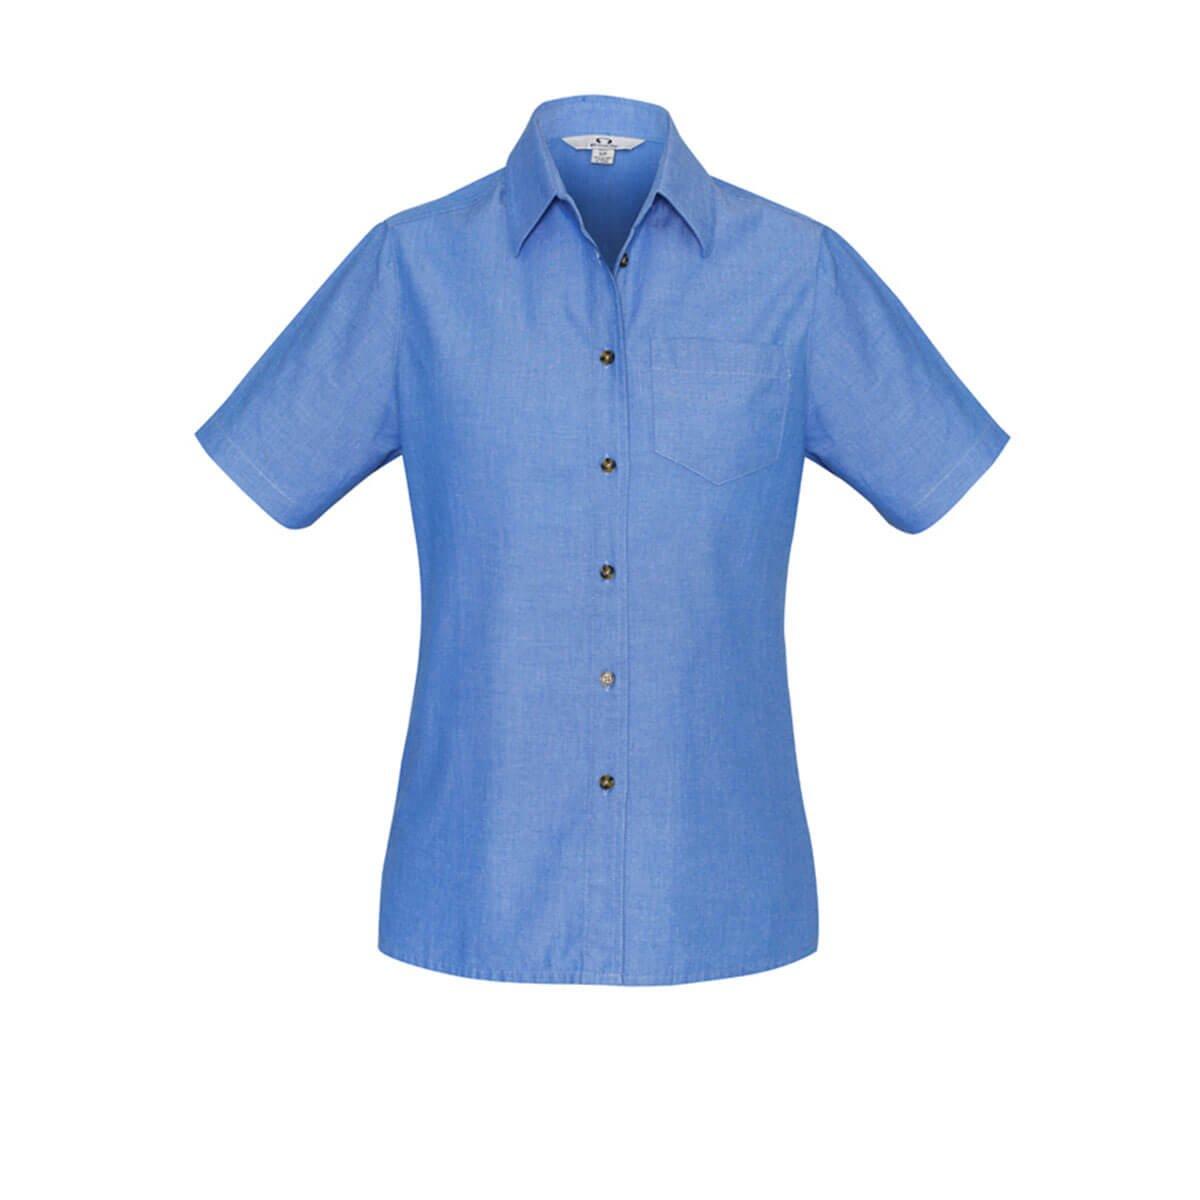 Ladies Wrinkle Free Chambray Short Sleeve Shirt-Chambray